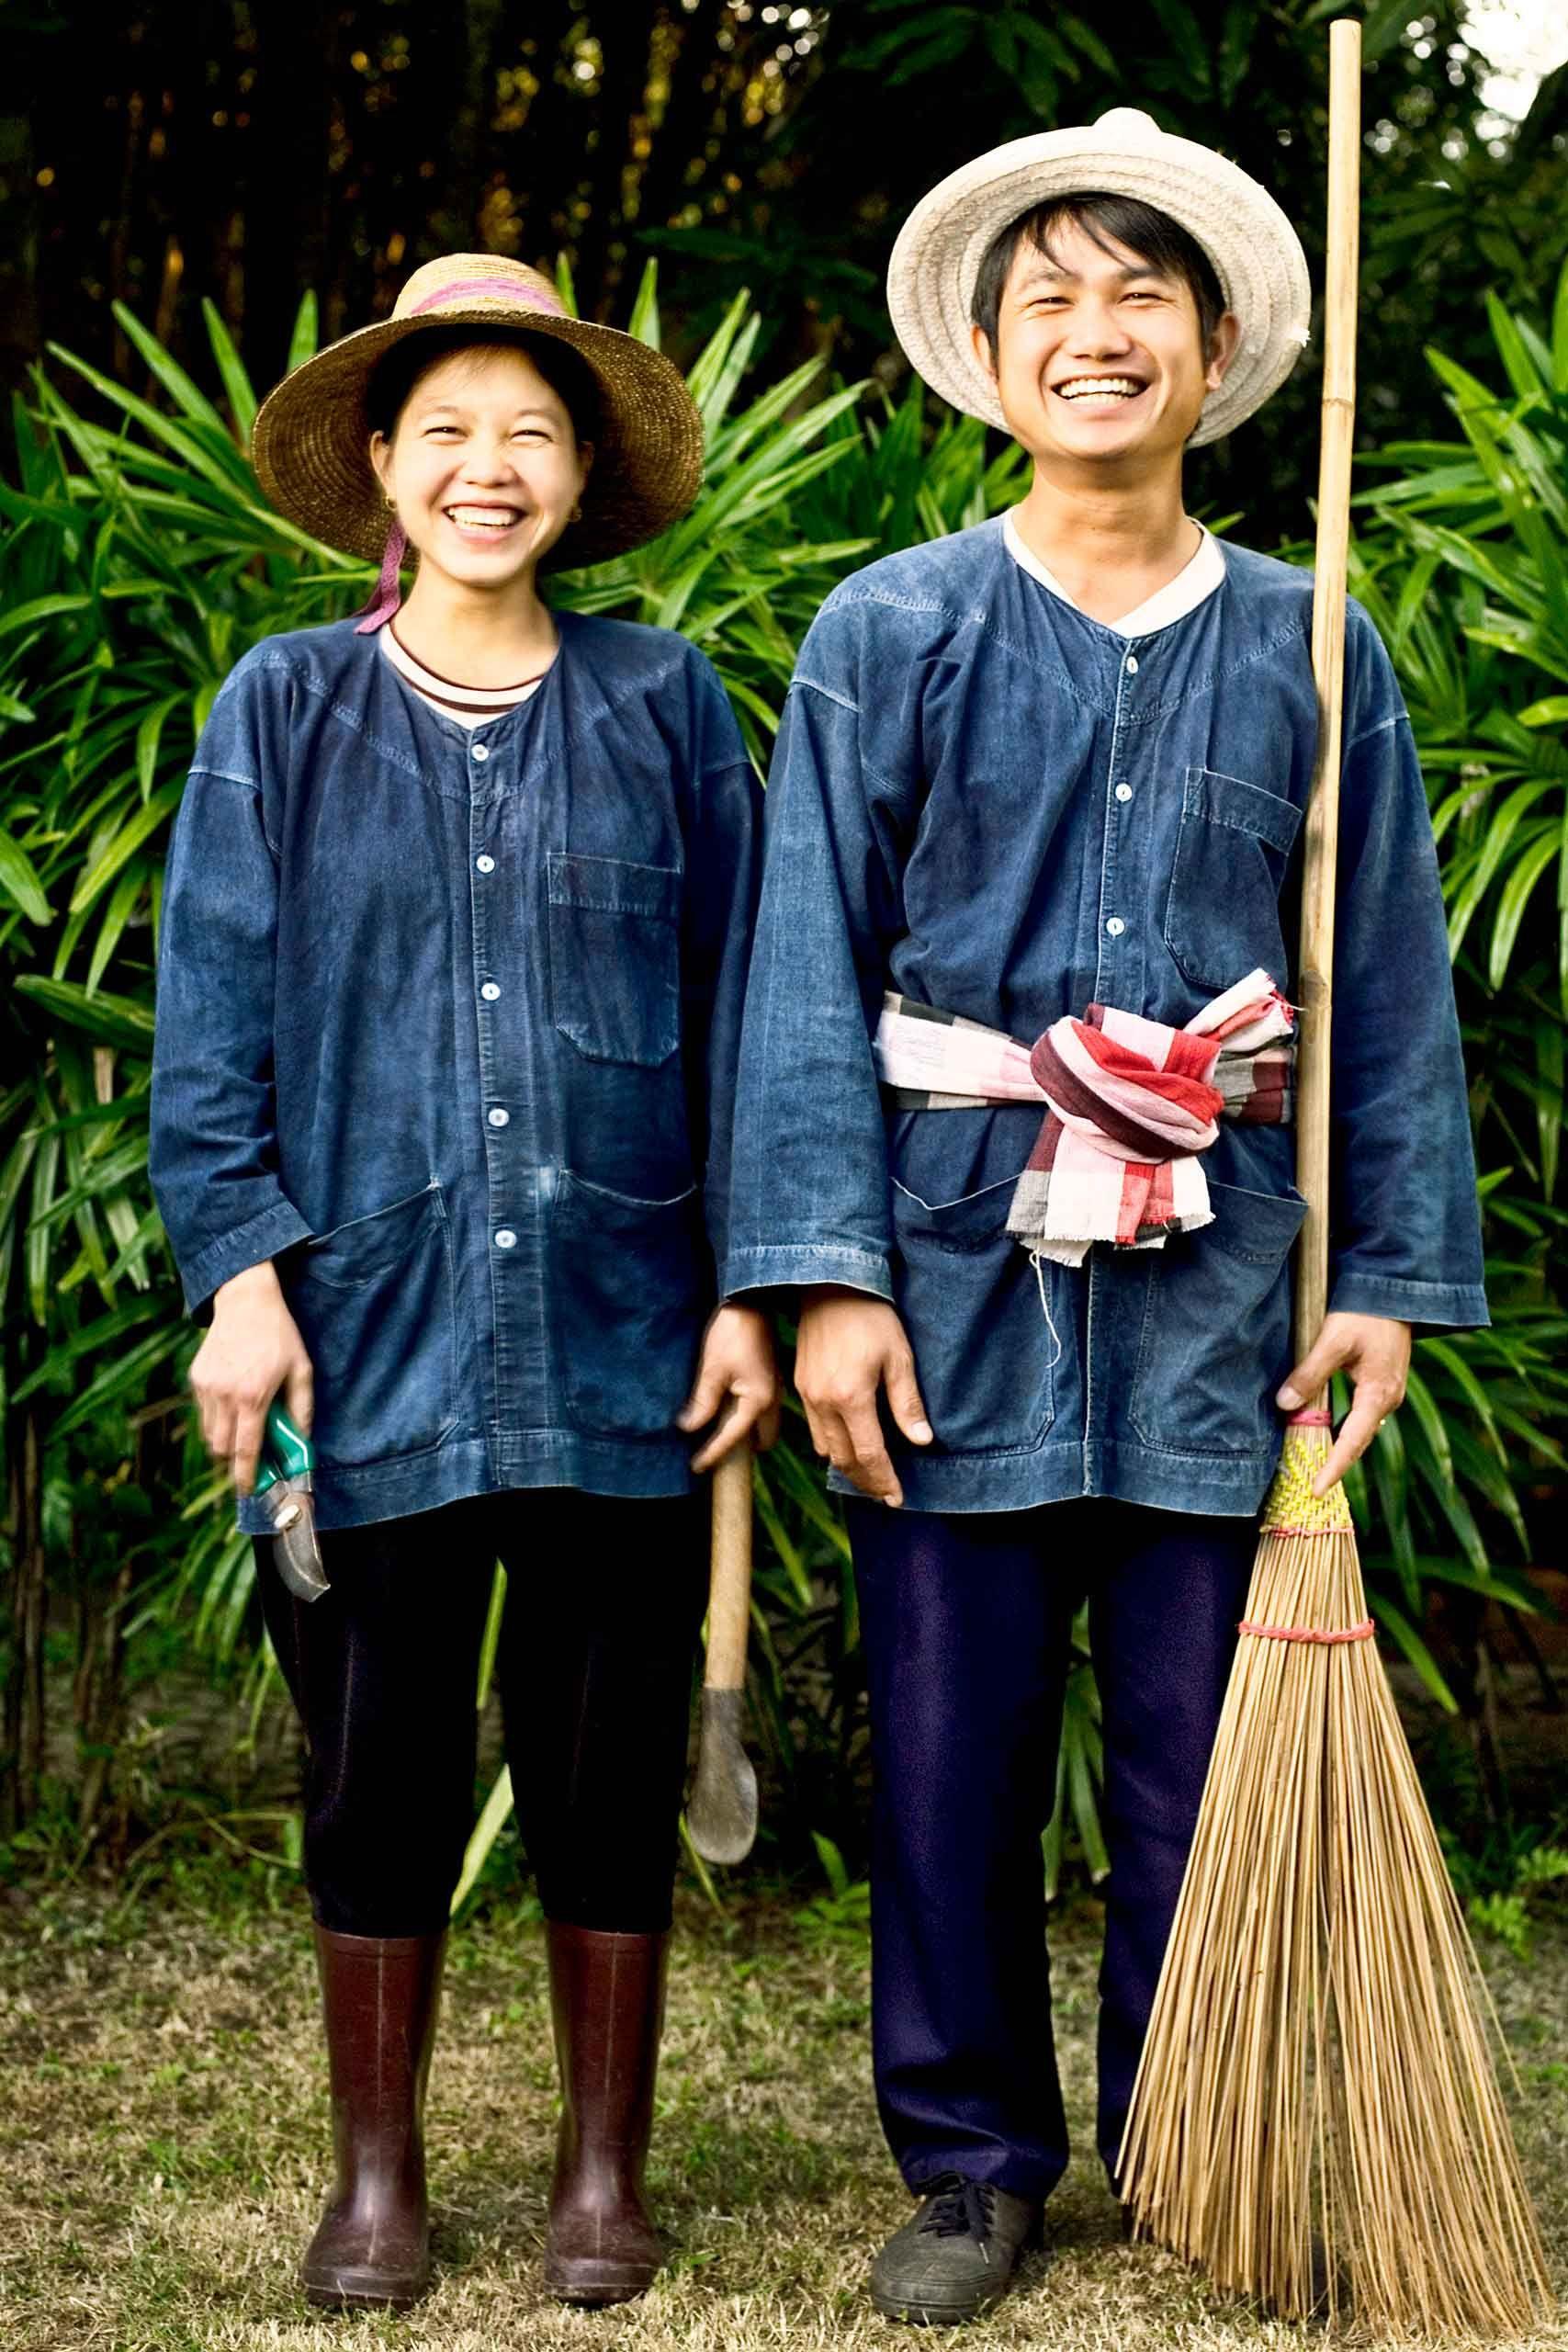 Gardeners-in-Thailand-ChiangMai-ChiangRai-by-HenrikOlundPhotography.jpg